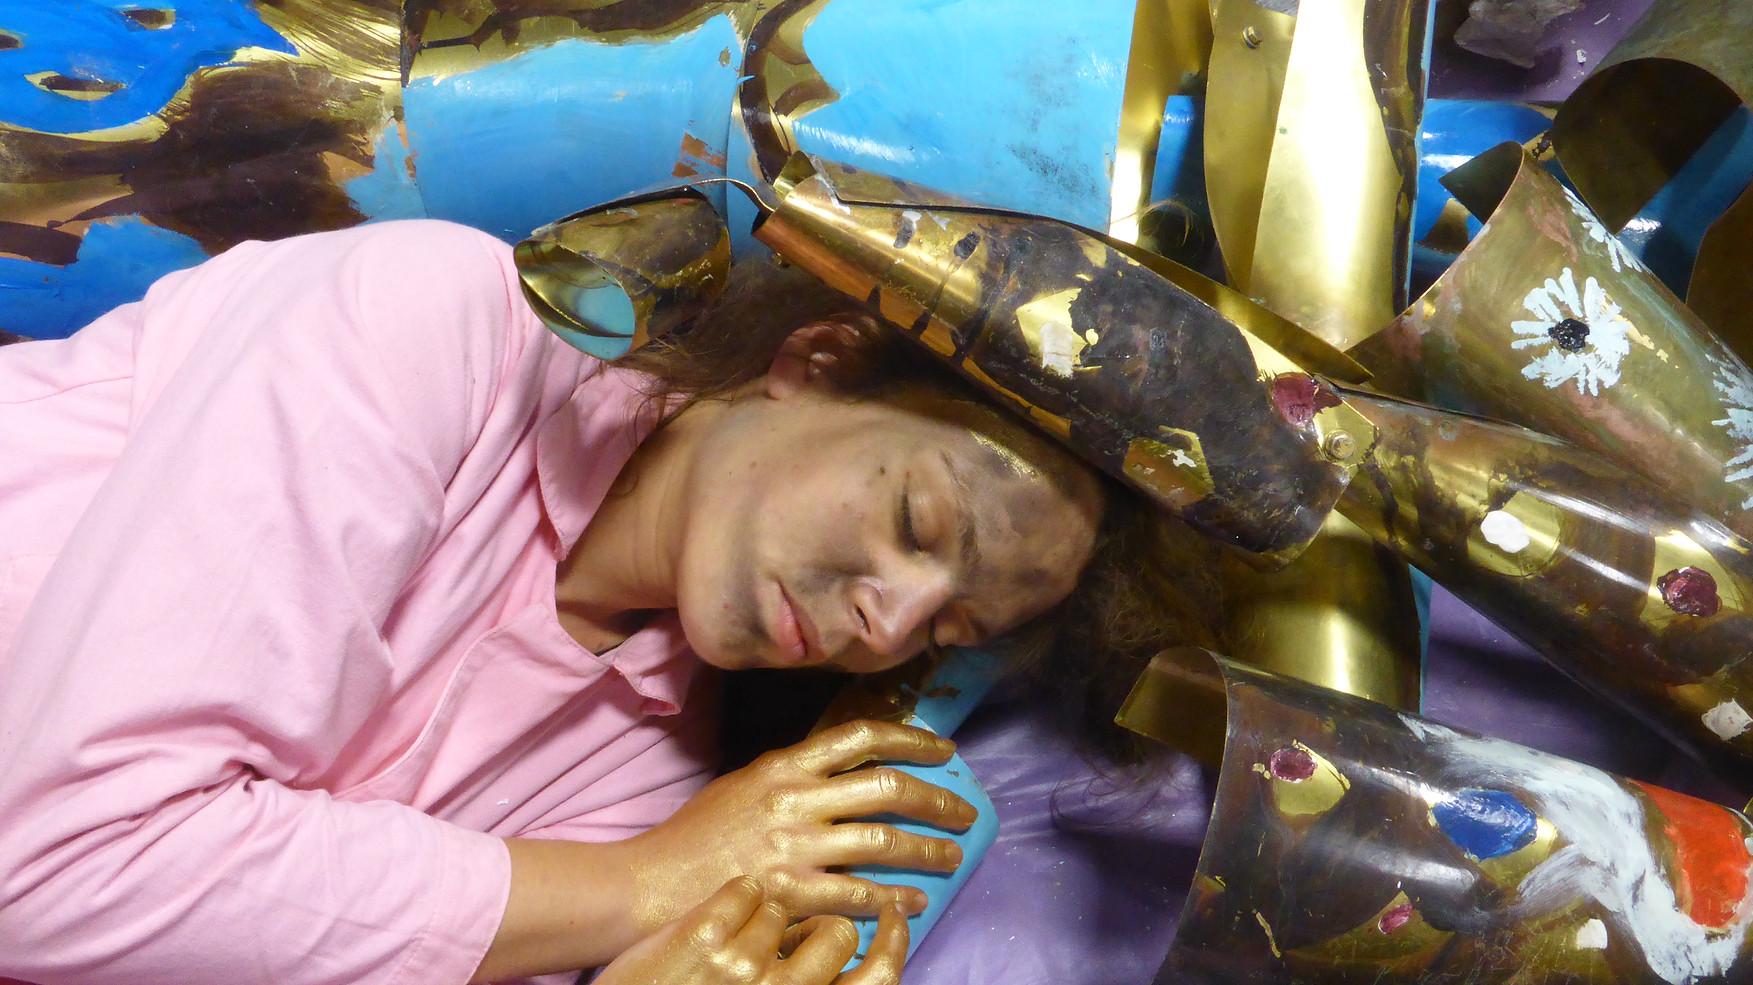 Caroline Mesquita, still from the video